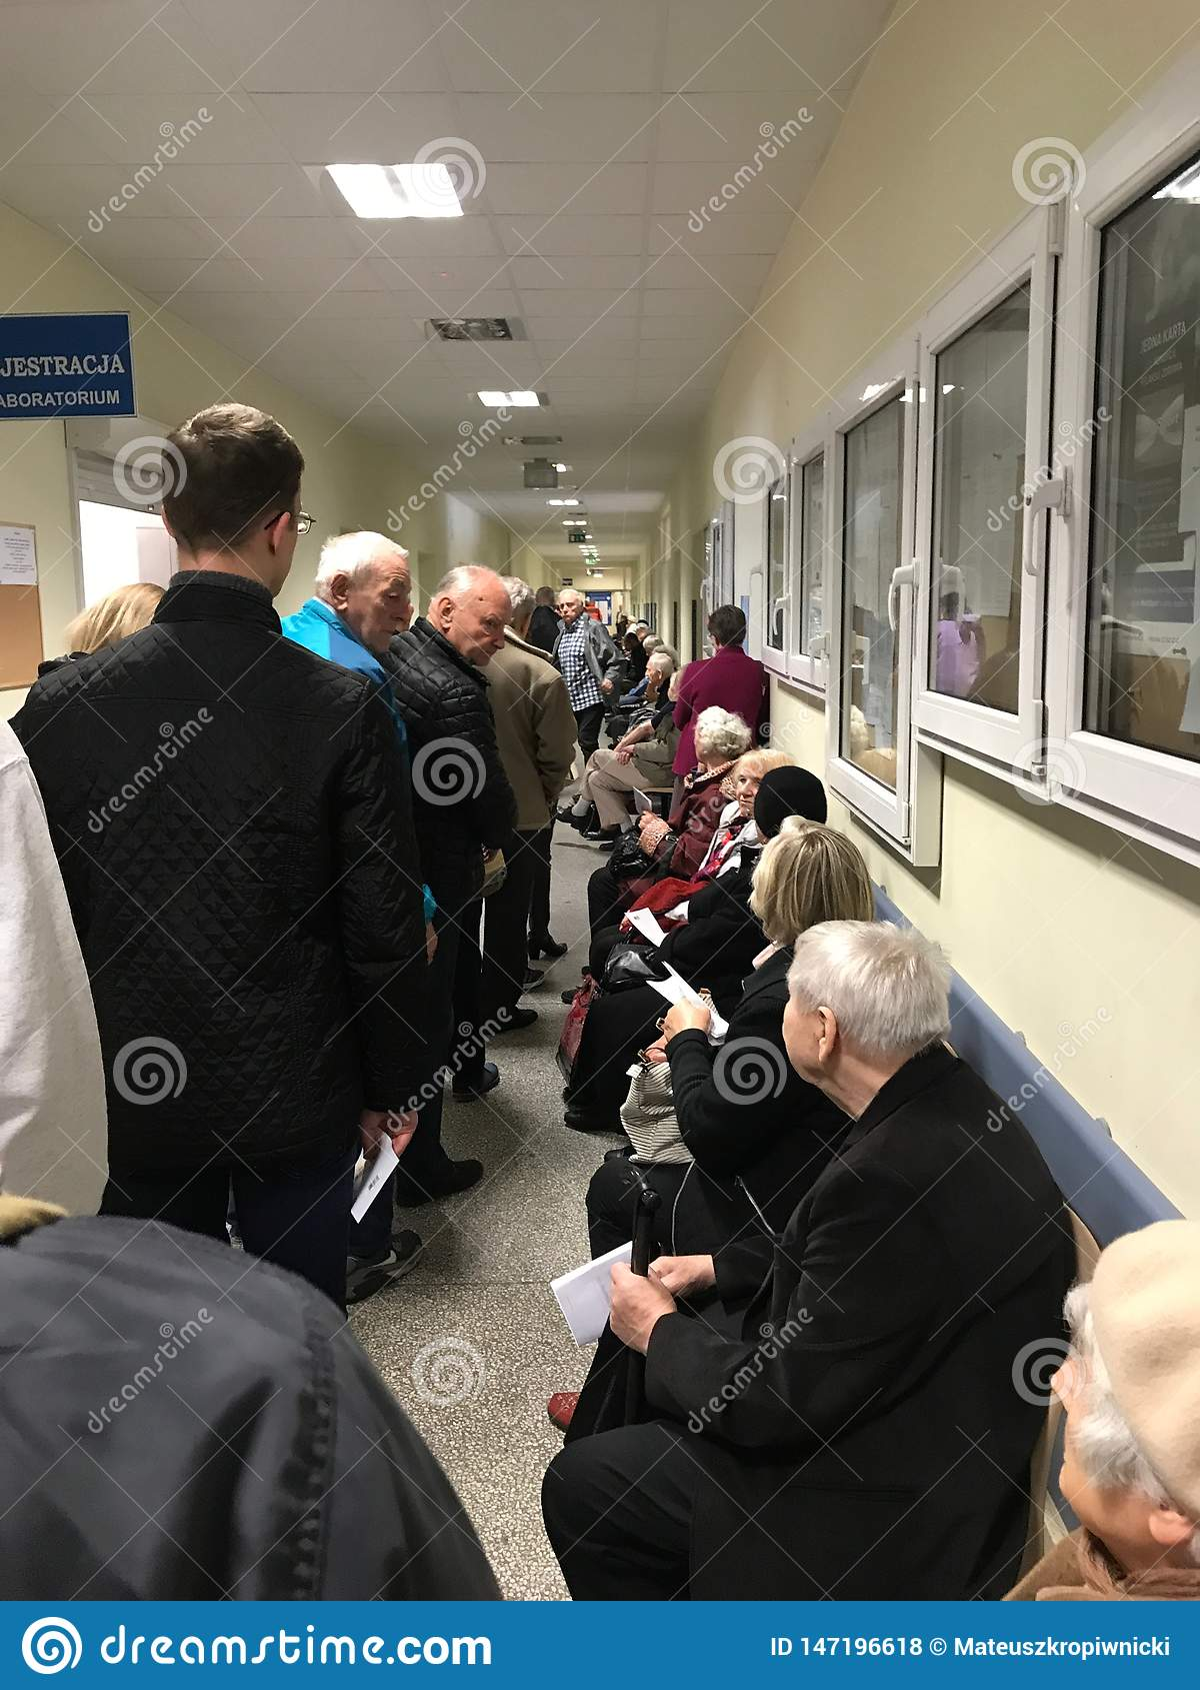 WrocÅ 'aw,波兰- 2019年5月6日:等待在长行的公共保健的患者对注册室 线那么长期是那